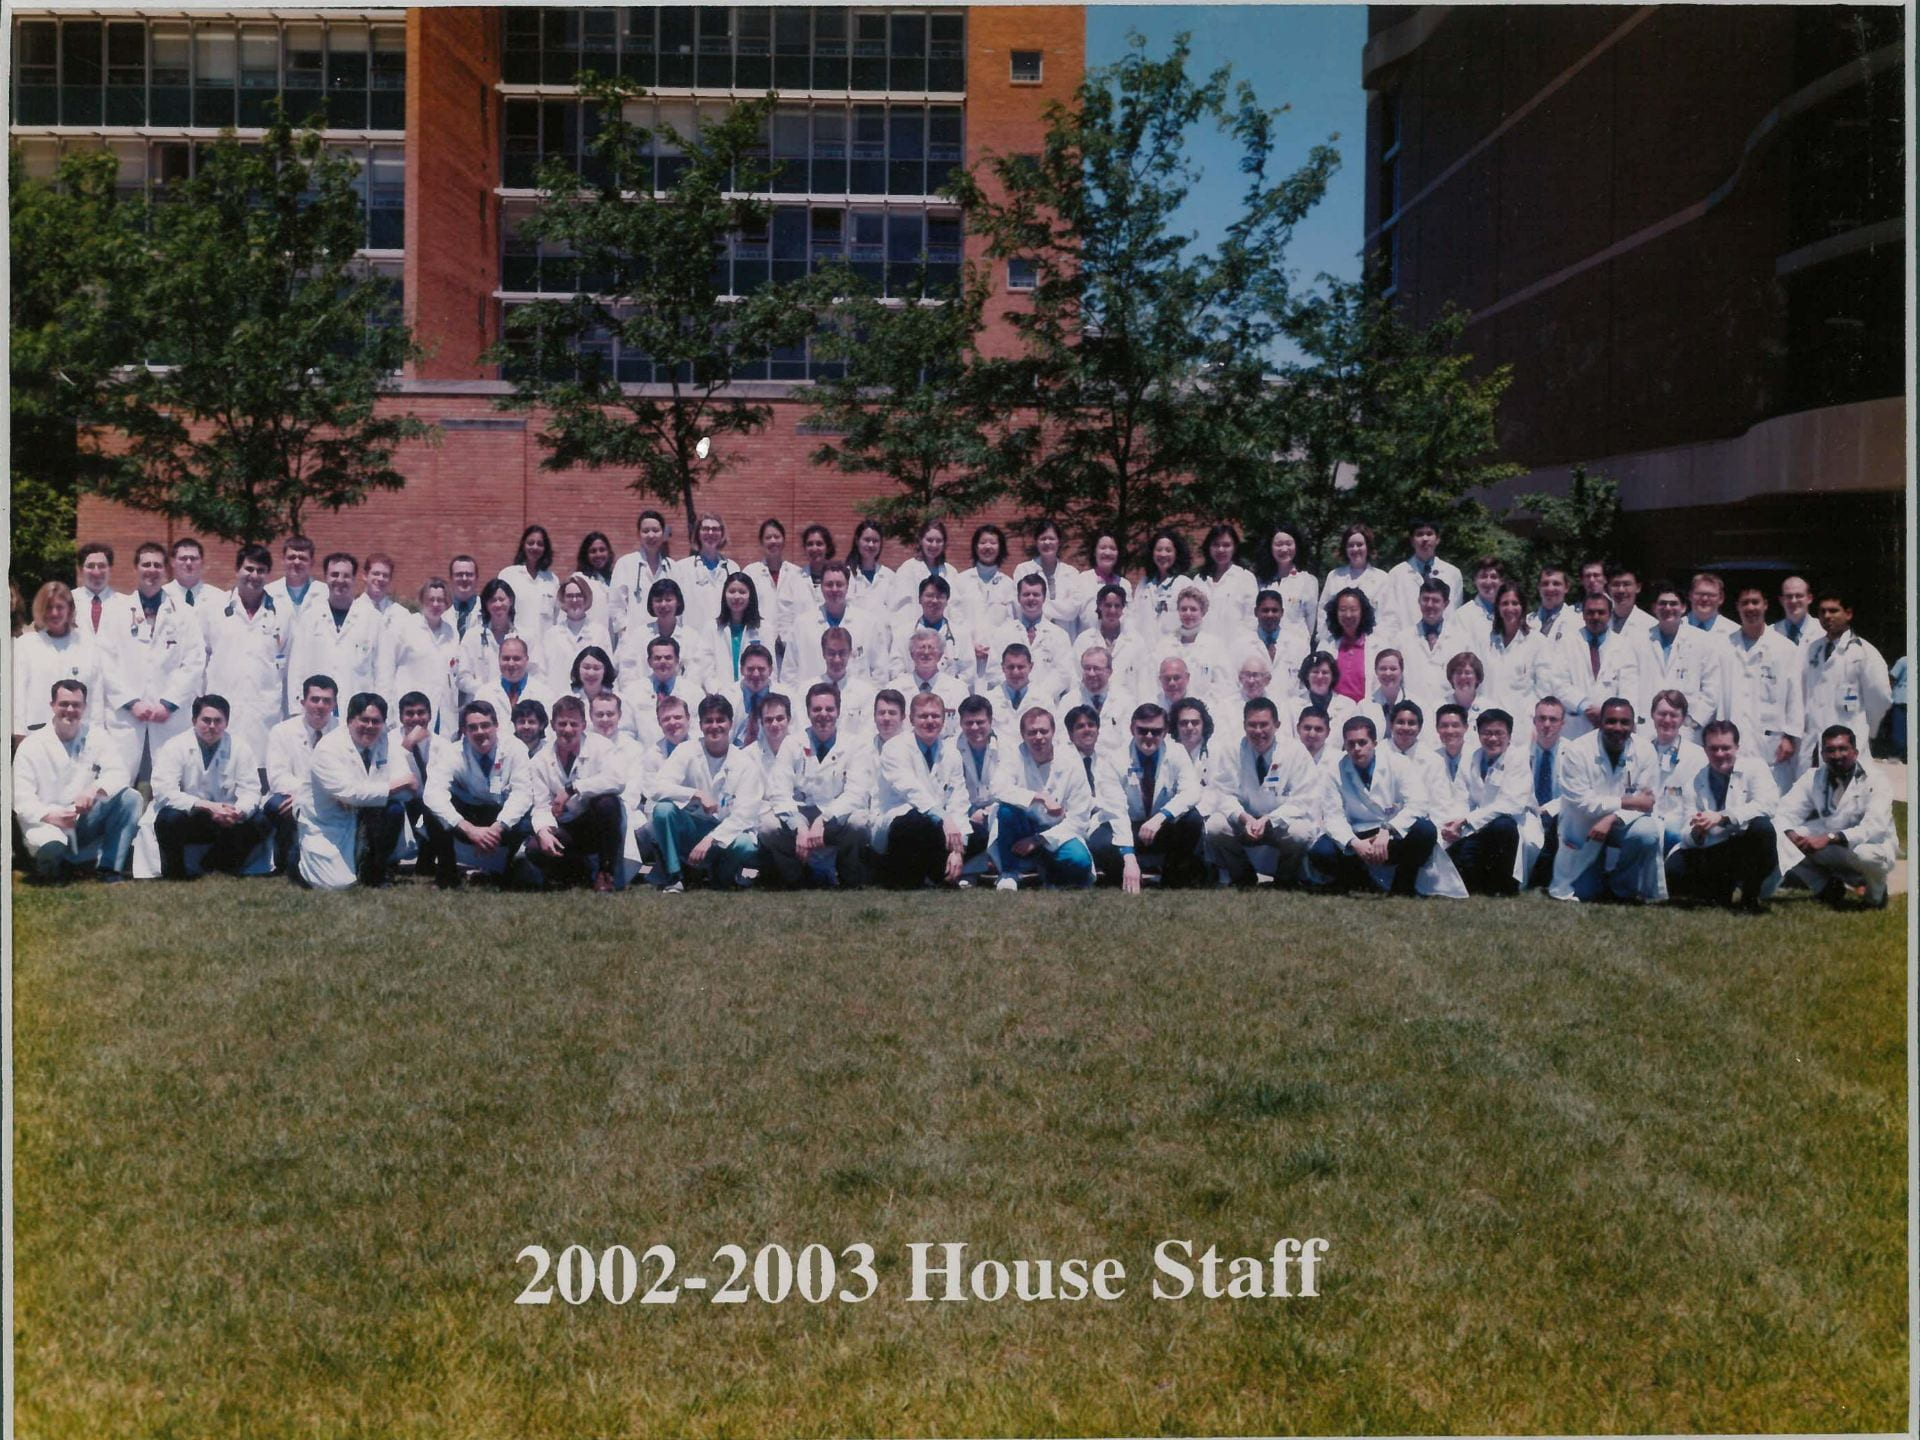 2002 Housestaff Photo